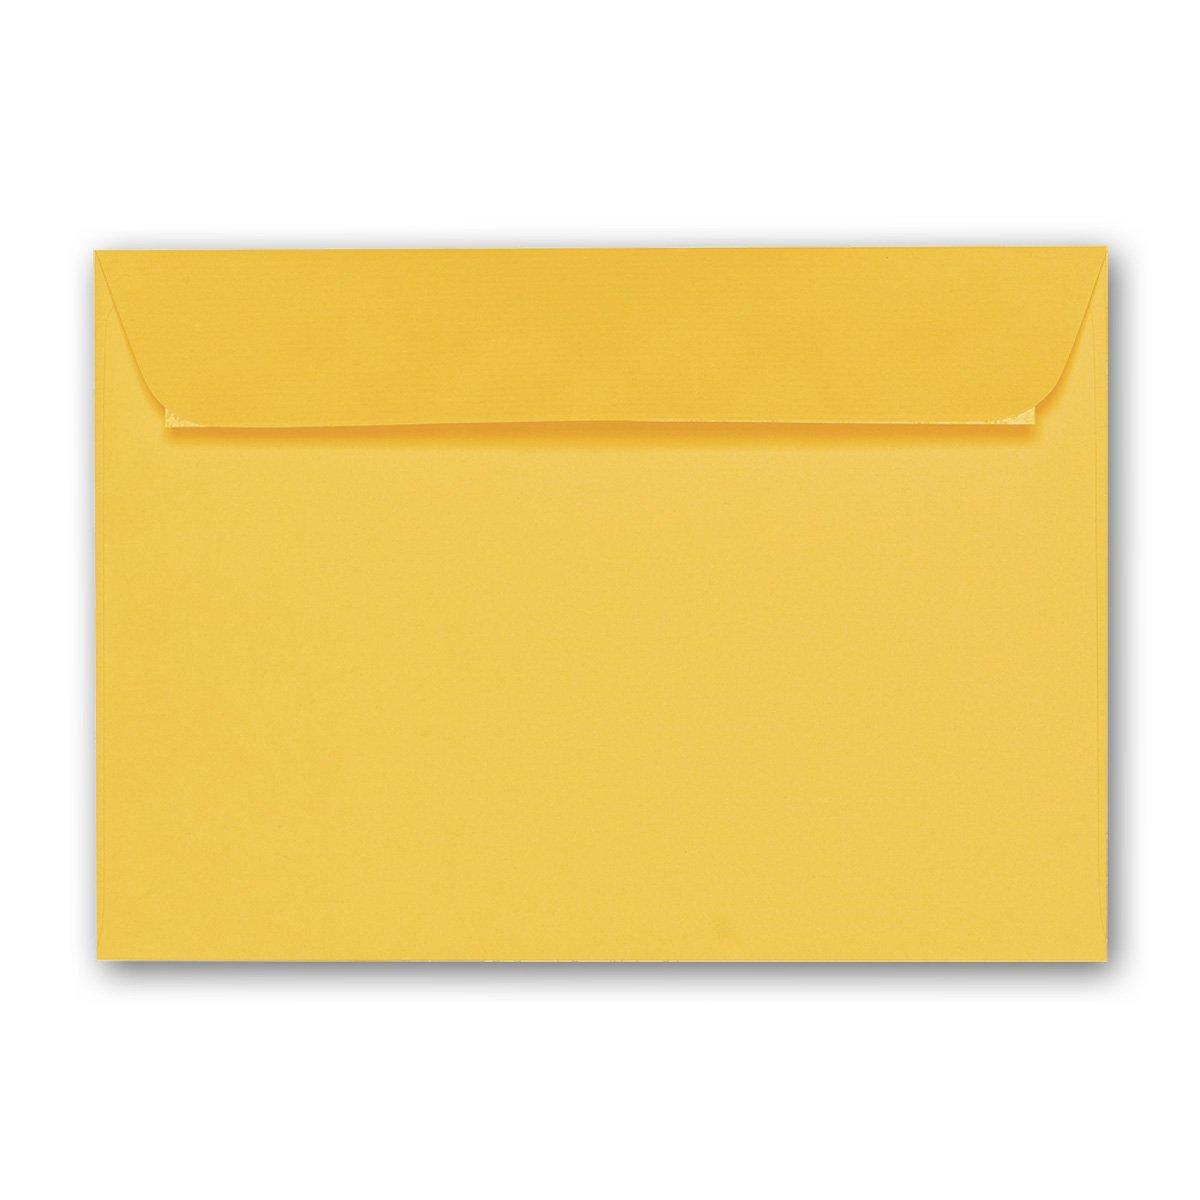 ARTOZ 200x Briefumschläge Din C6 Flieder I I I 16,2 x 11,4 cm KuGrün ohne Fenster I Umschläge Selbstklebend haftklebend I Serie Artoz 1001 B07GZNQHF4 | Up-to-date Styling  | Sale Online Shop  | Reichhaltiges Design  c6a8ae